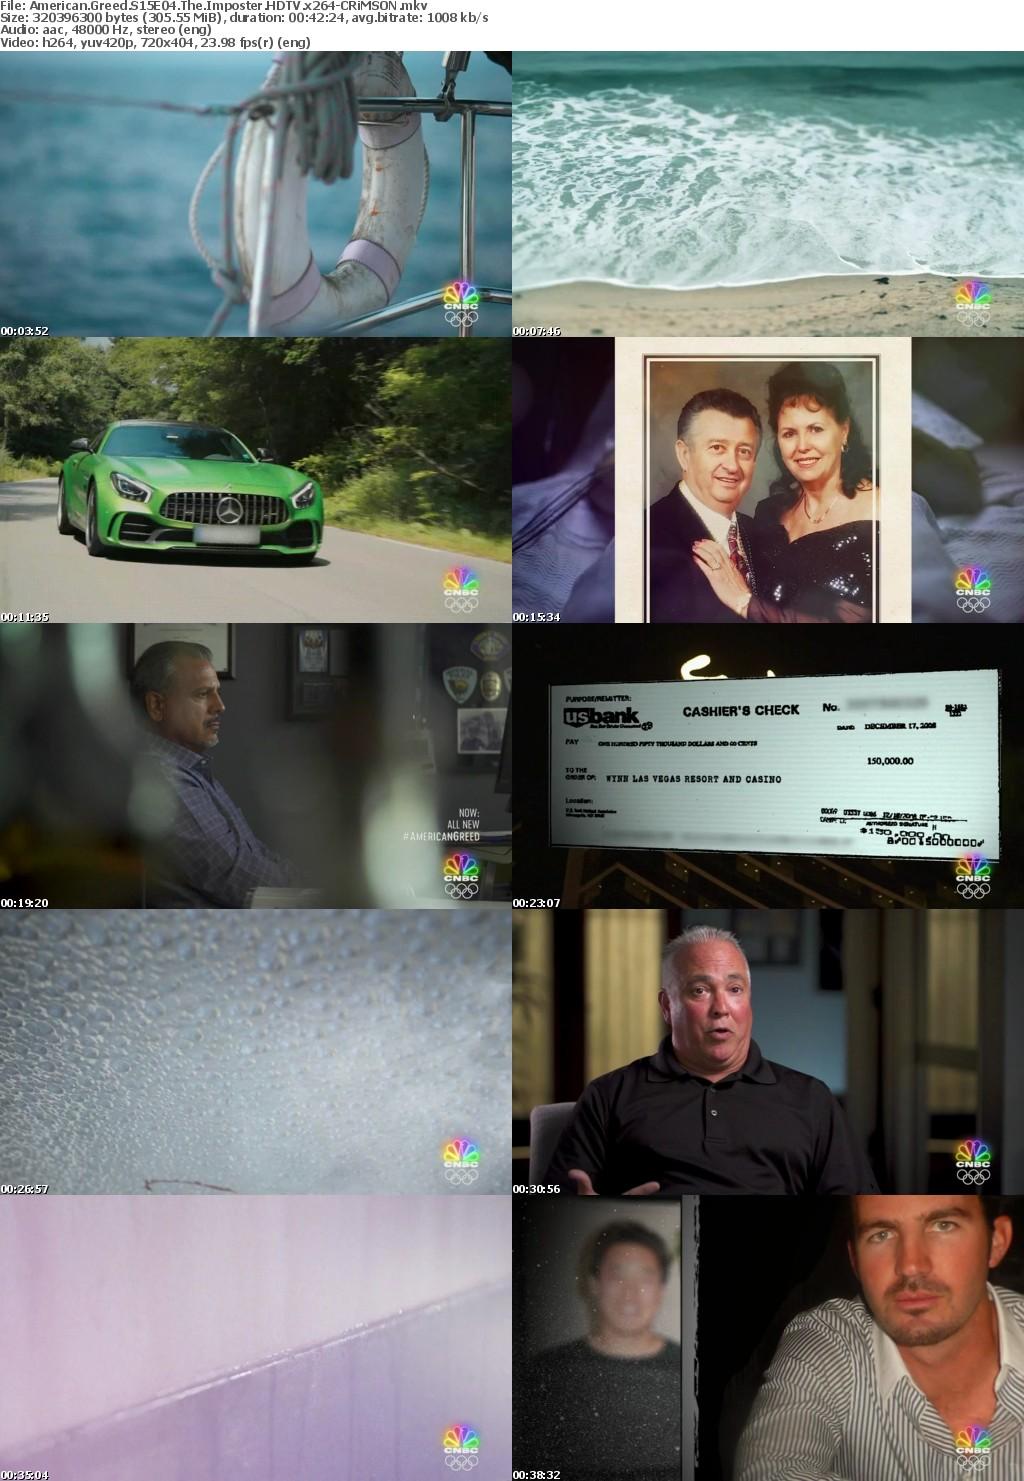 American Greed S15E04 The Imposter HDTV x264-CRiMSON